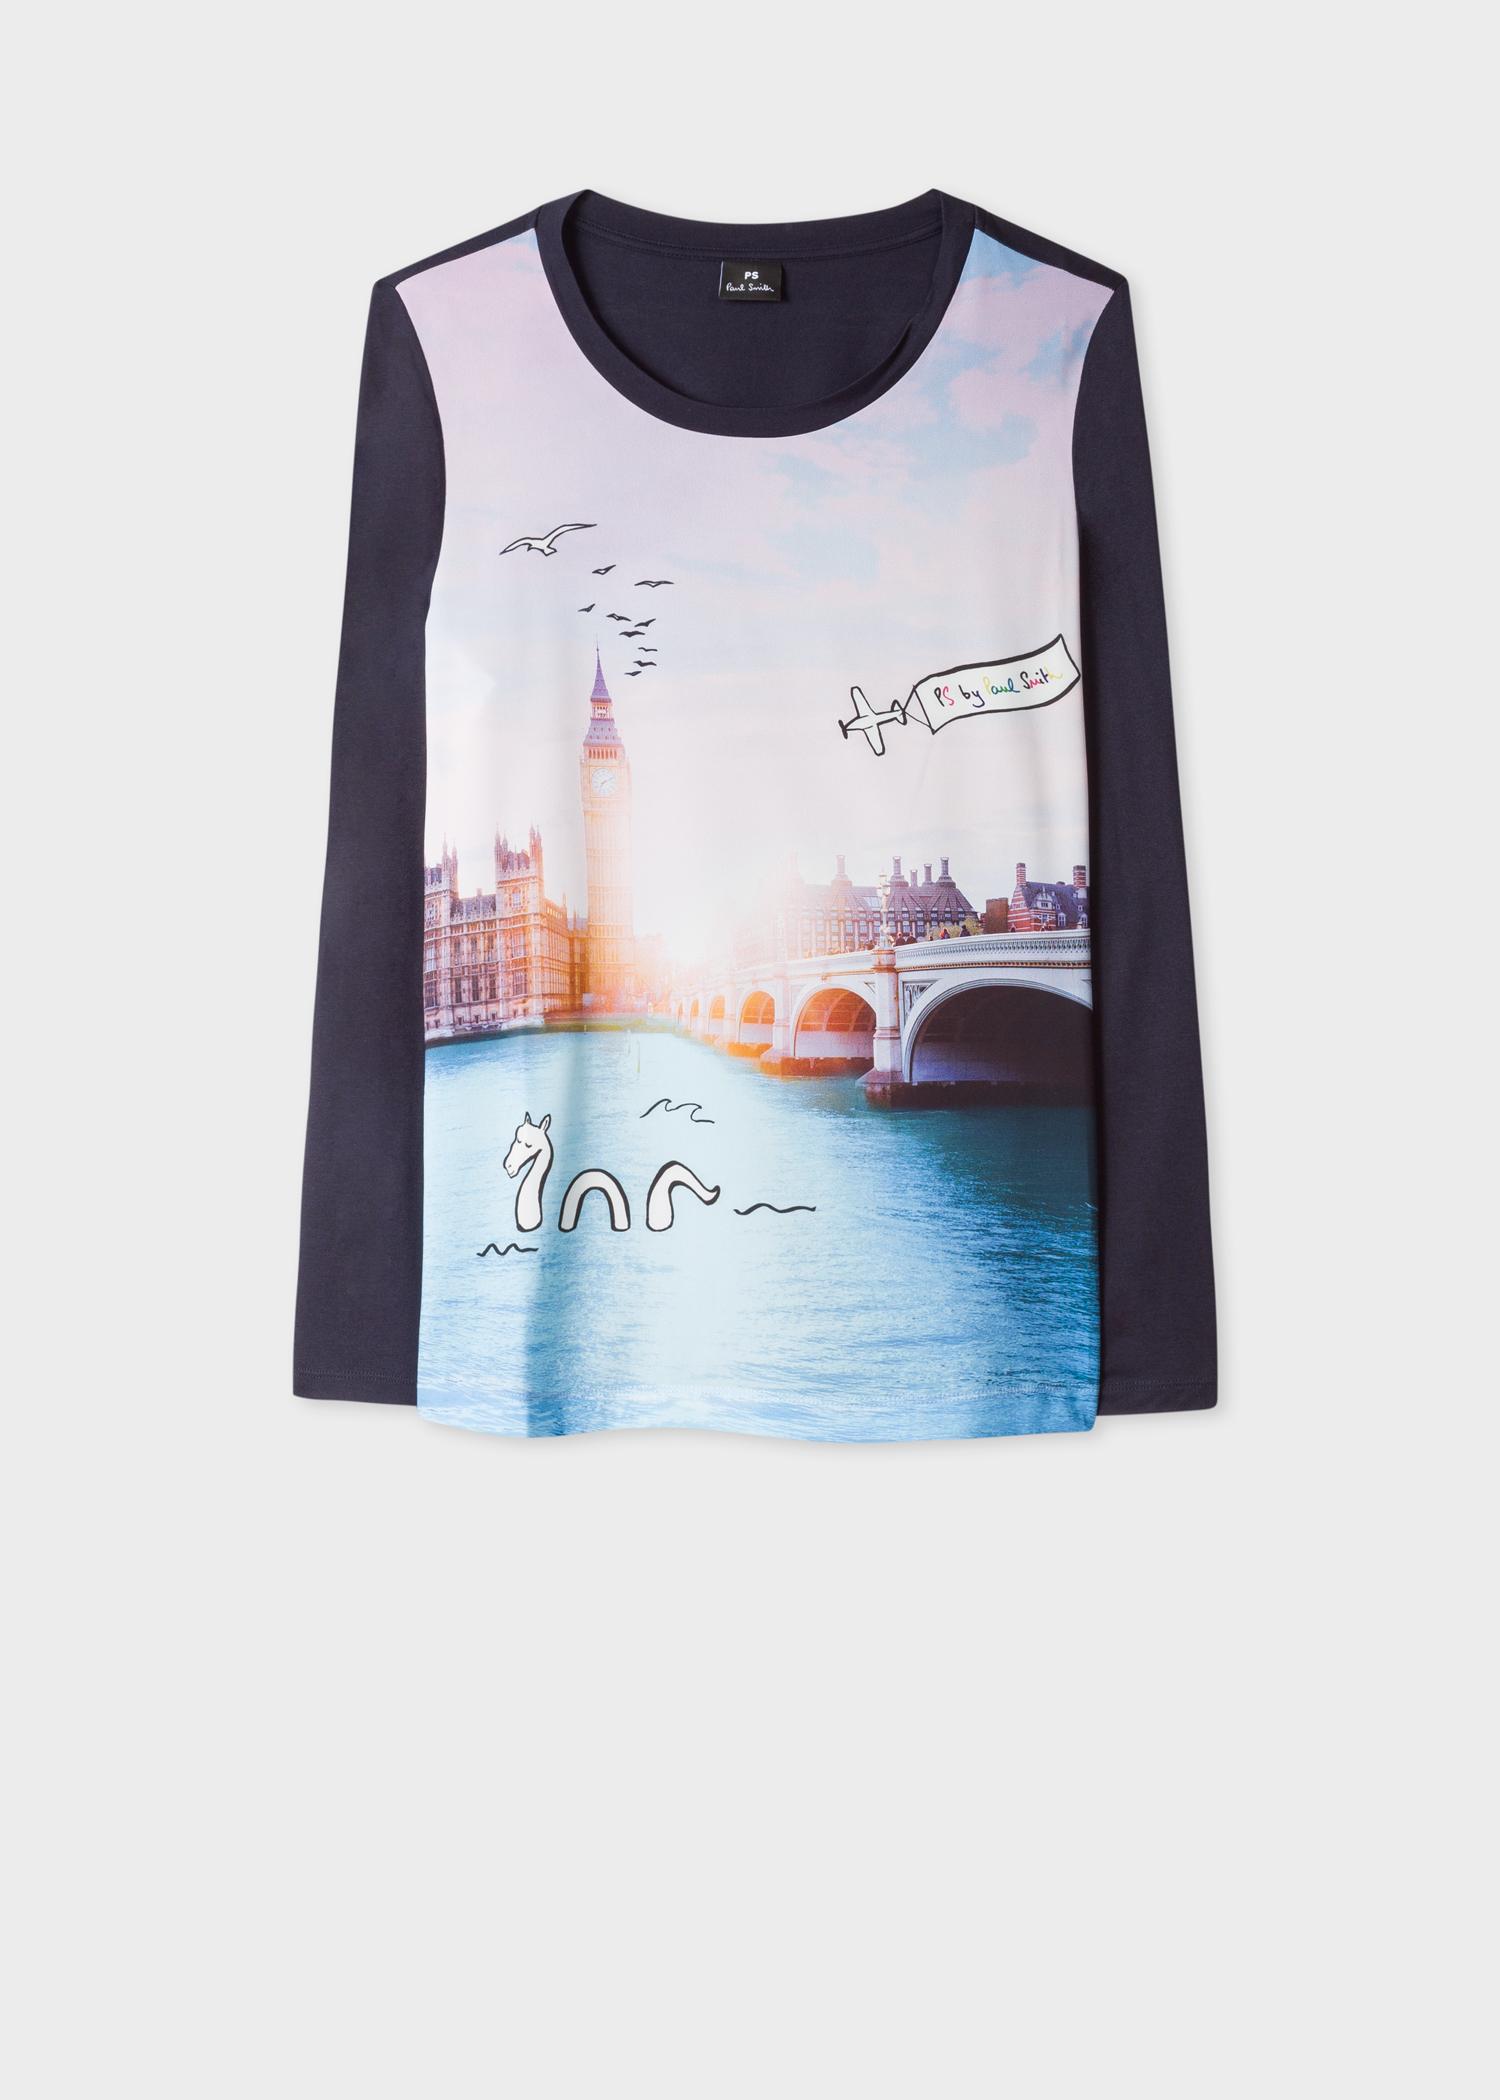 acbf58679 Women's Dark Navy 'London Photo' Print Long-Sleeve T-Shirt - Paul ...